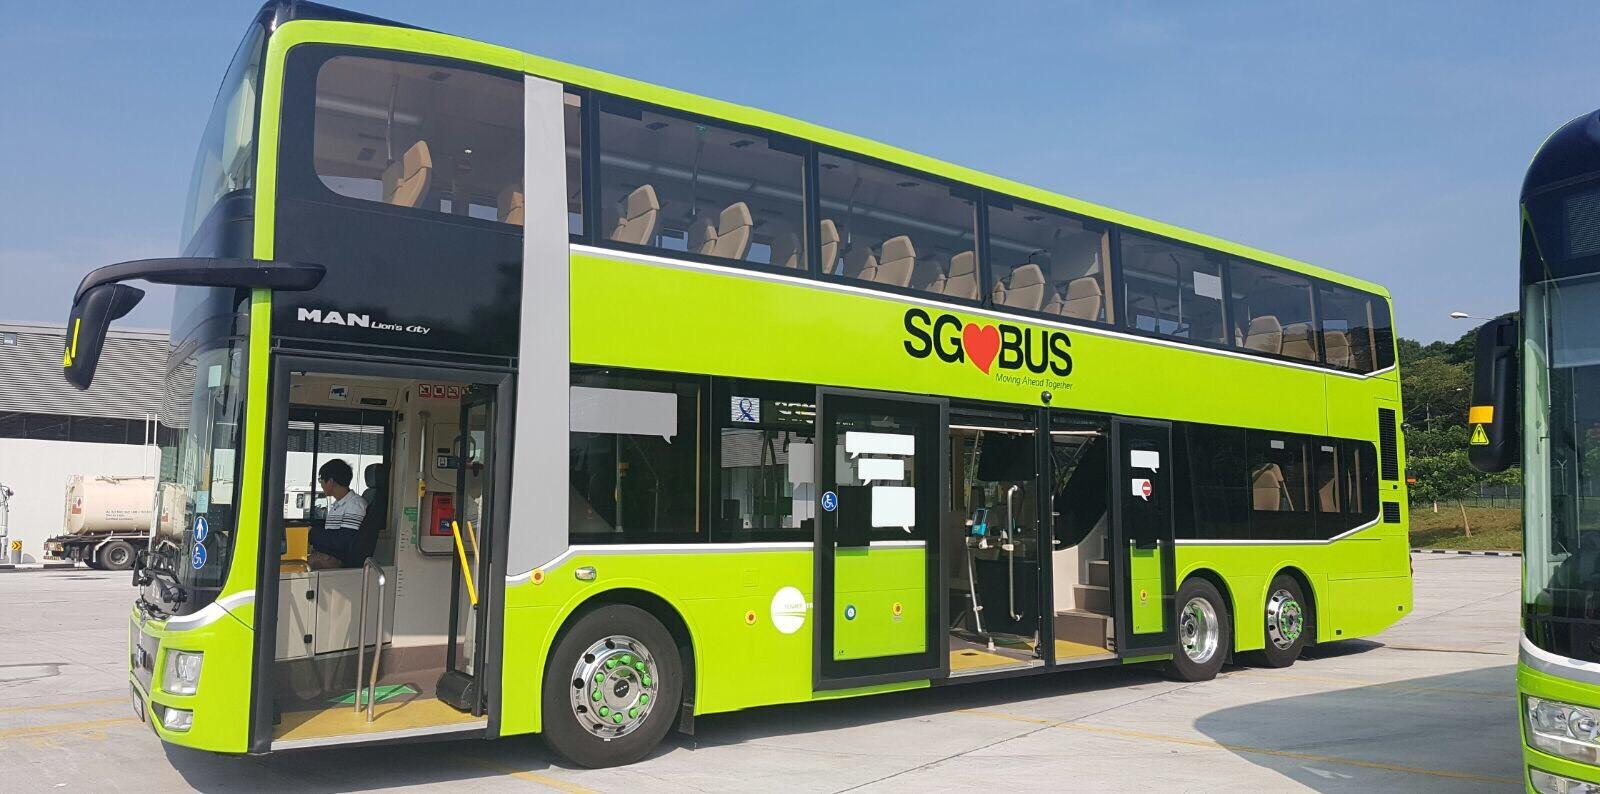 double deck bus with three doors